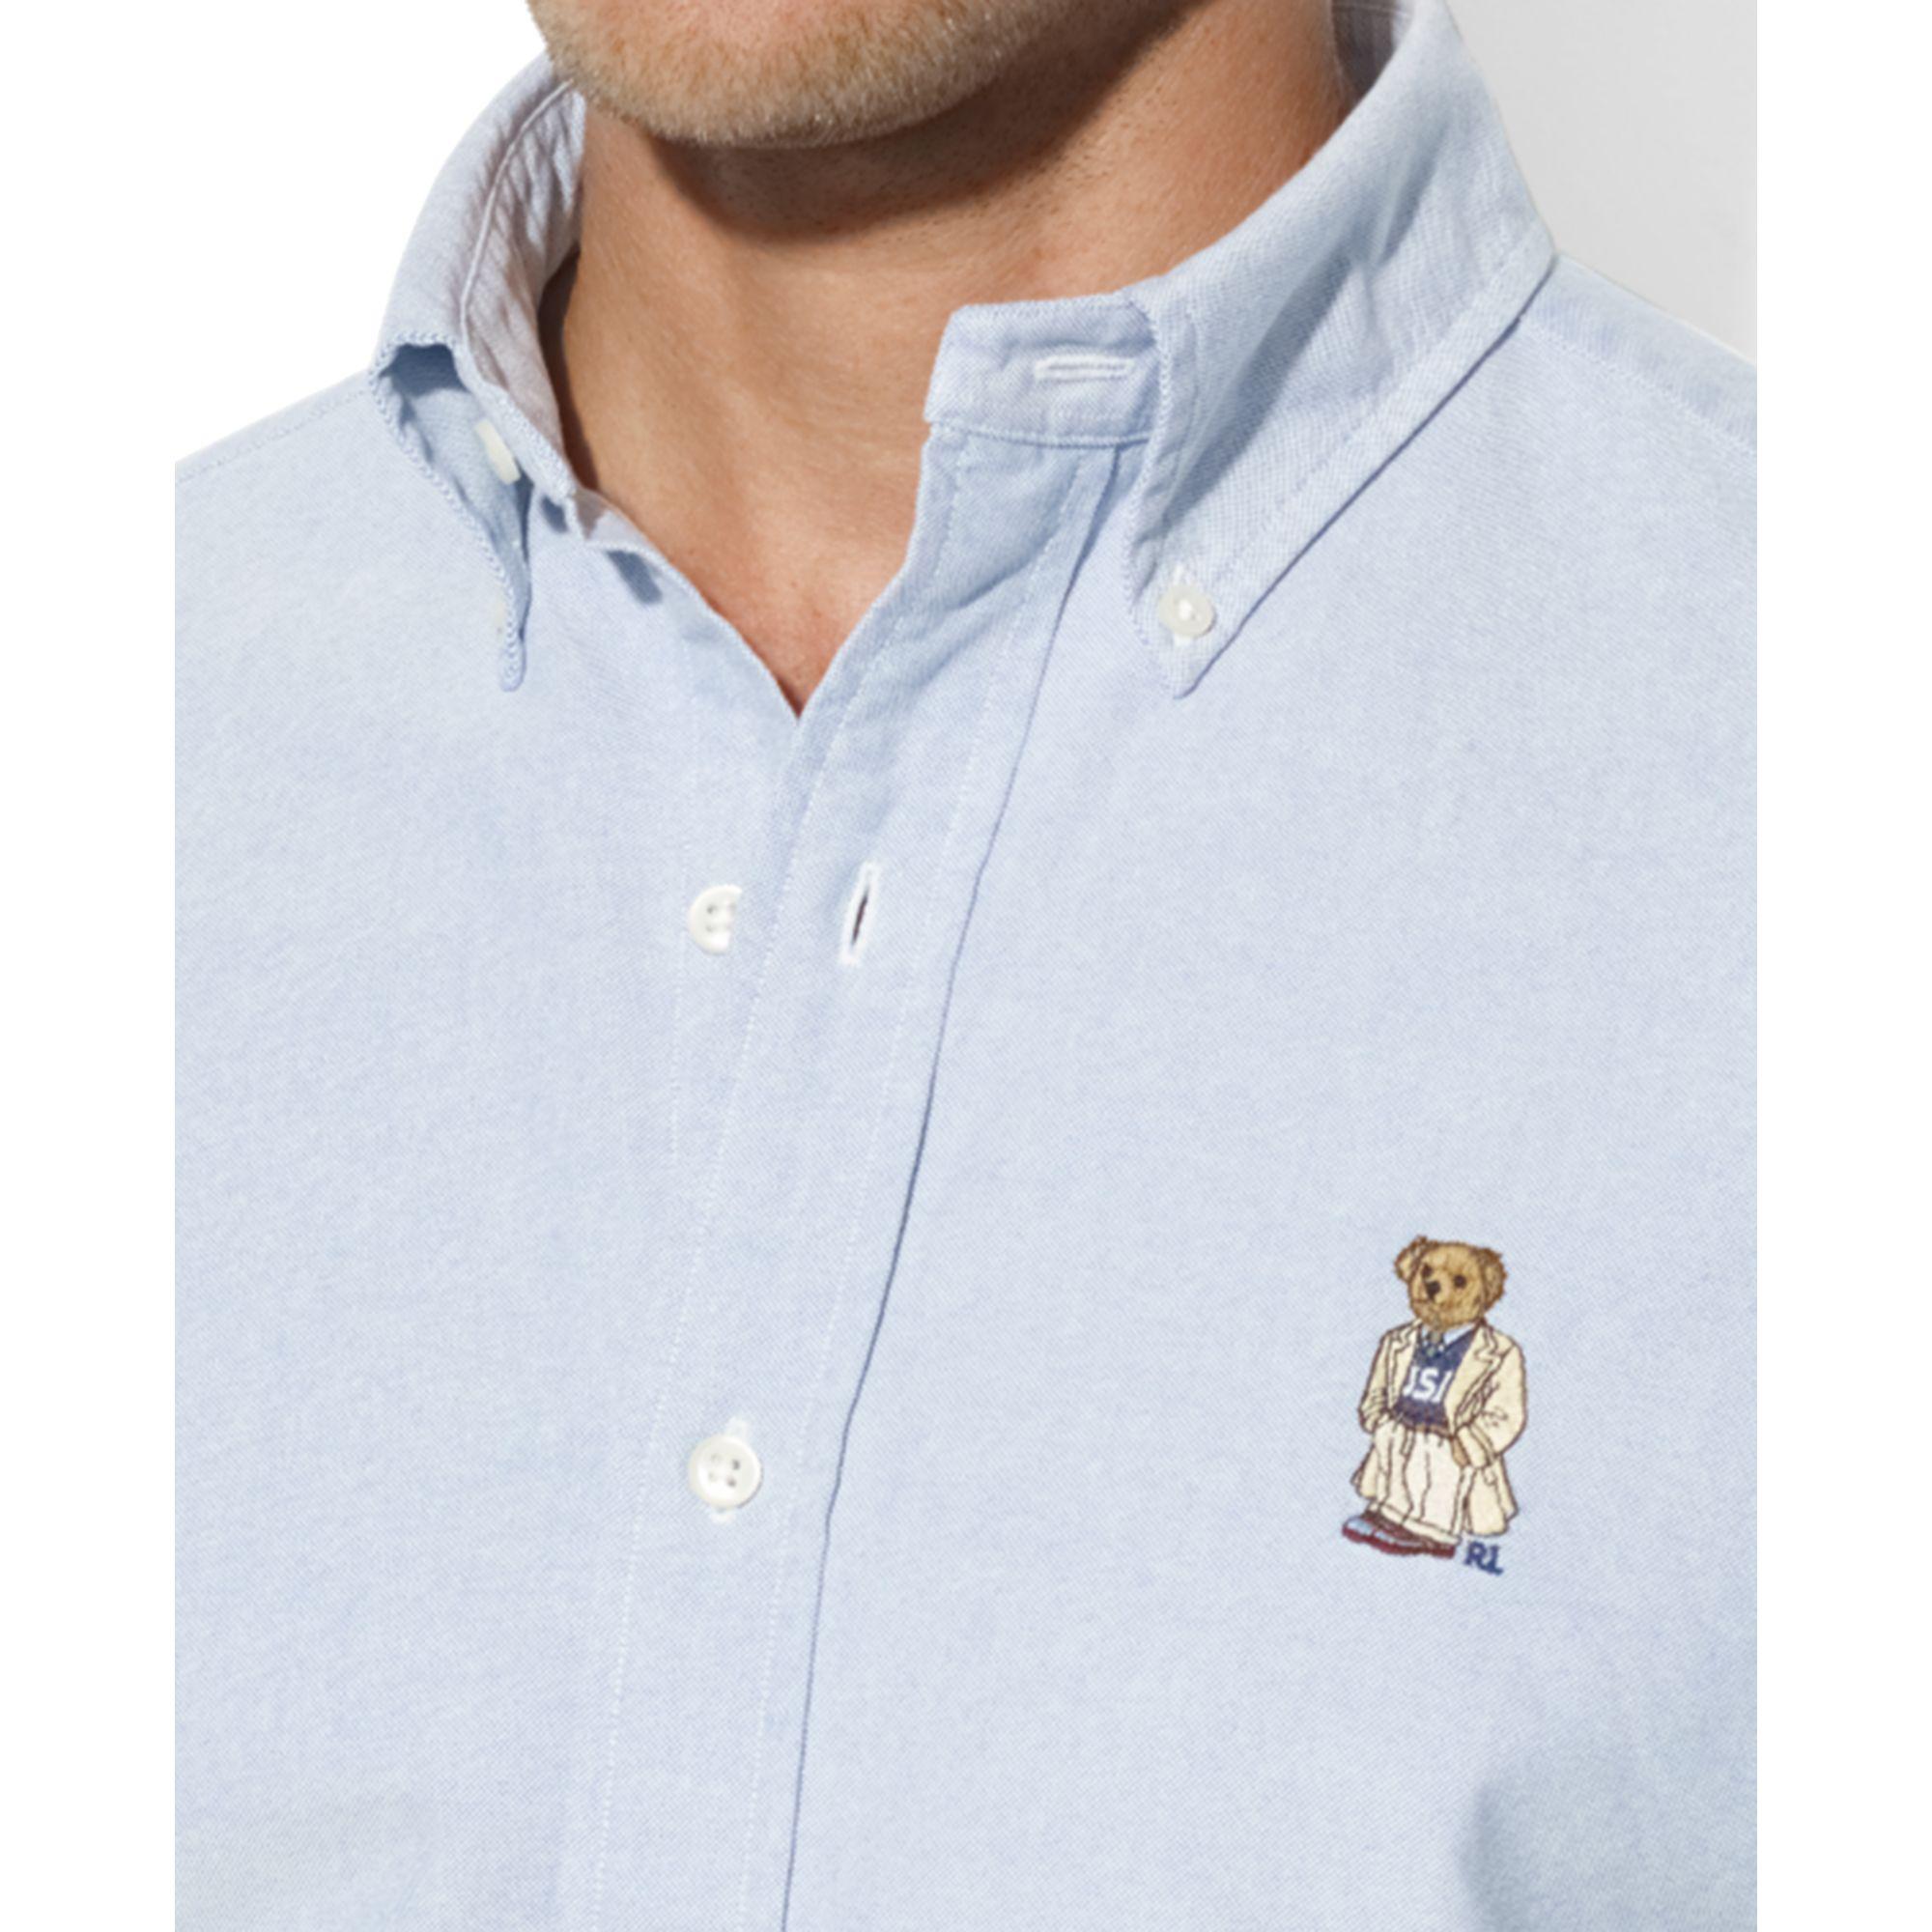 Cheap Burberry Shirts For Men